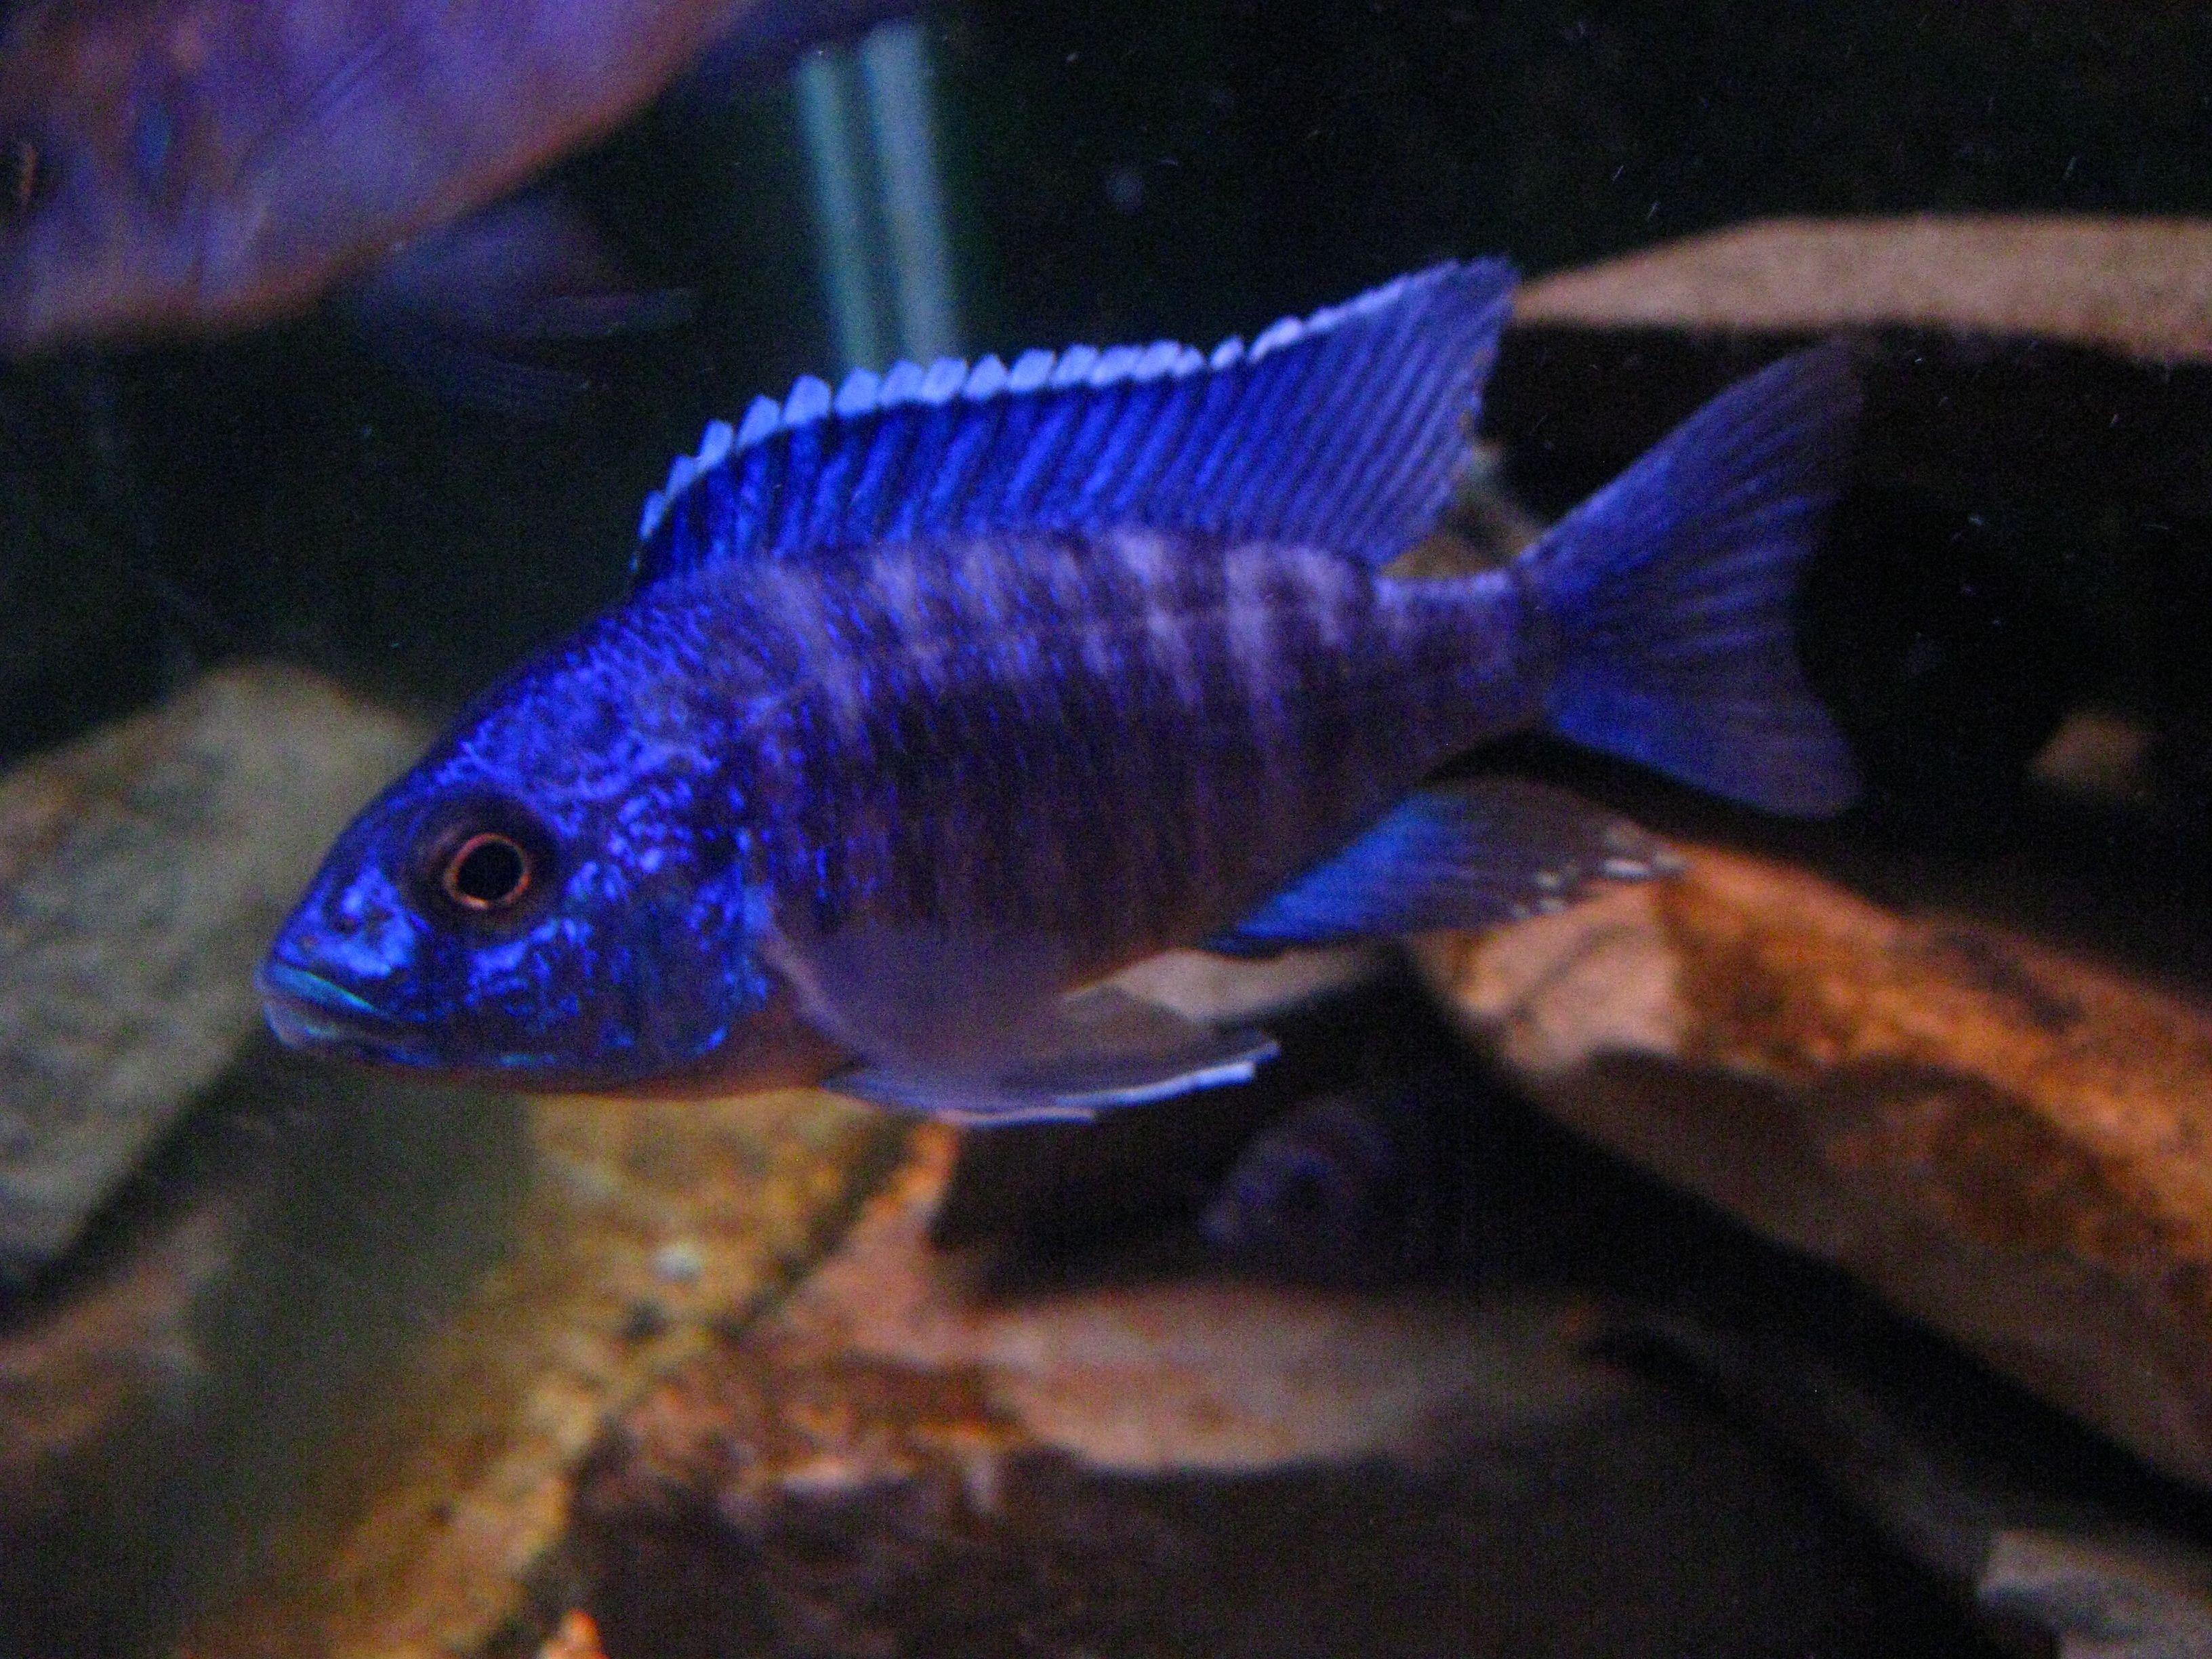 Cichlids Com Blue Regal Peacock Cichlid Fish Cichlids African Cichlids